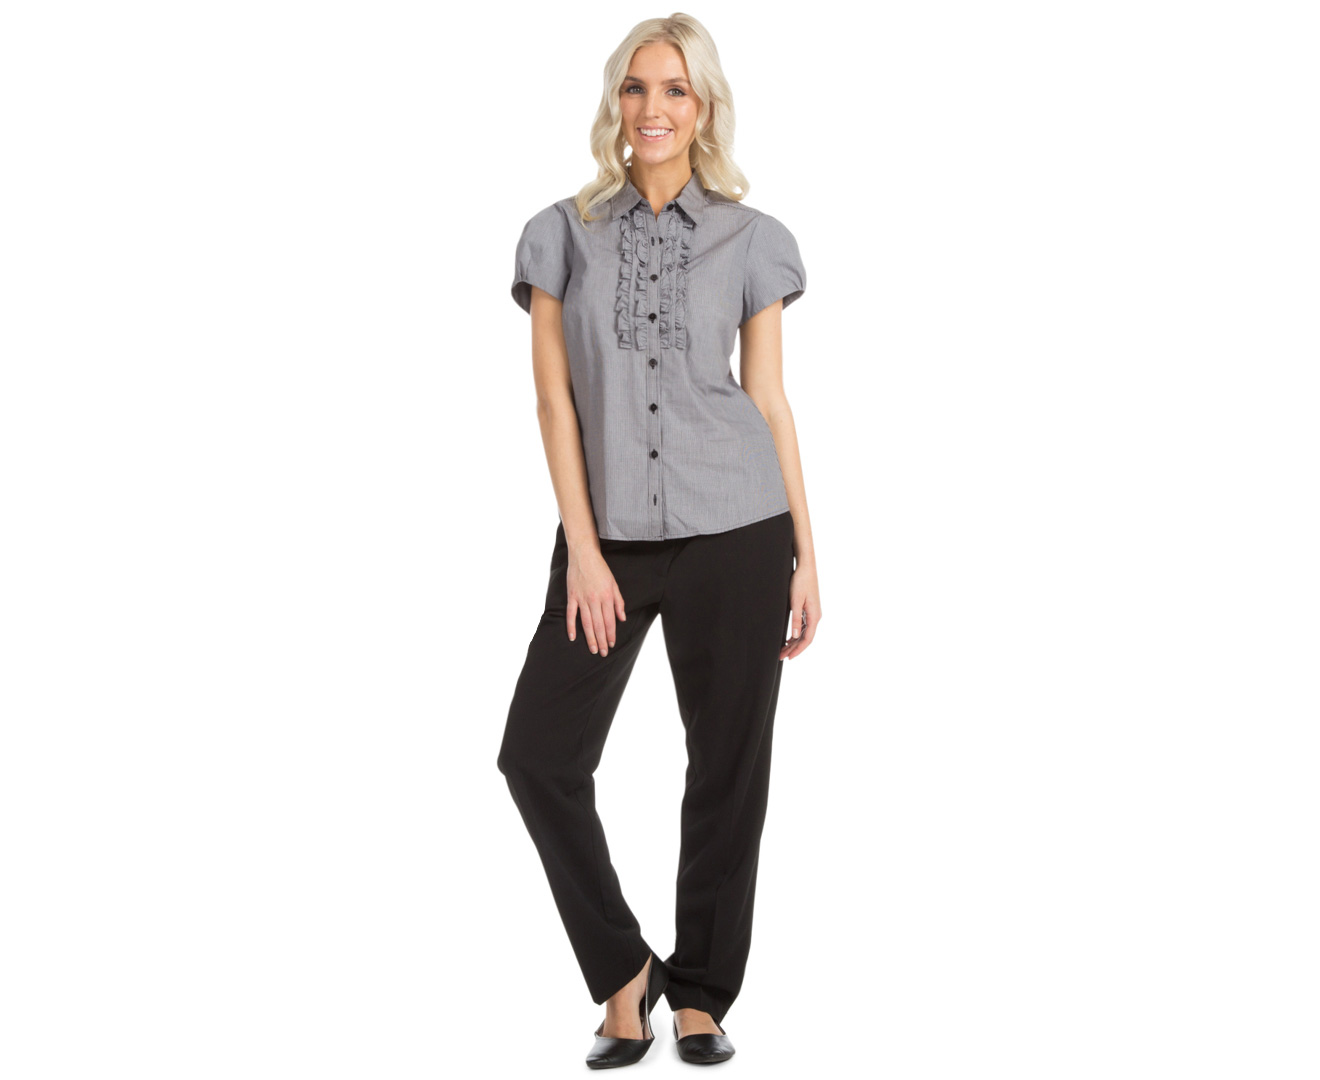 Cool  NEW Gray Dapple Womens Size 8 PleatFront WideLeg Pants  Walmartcom